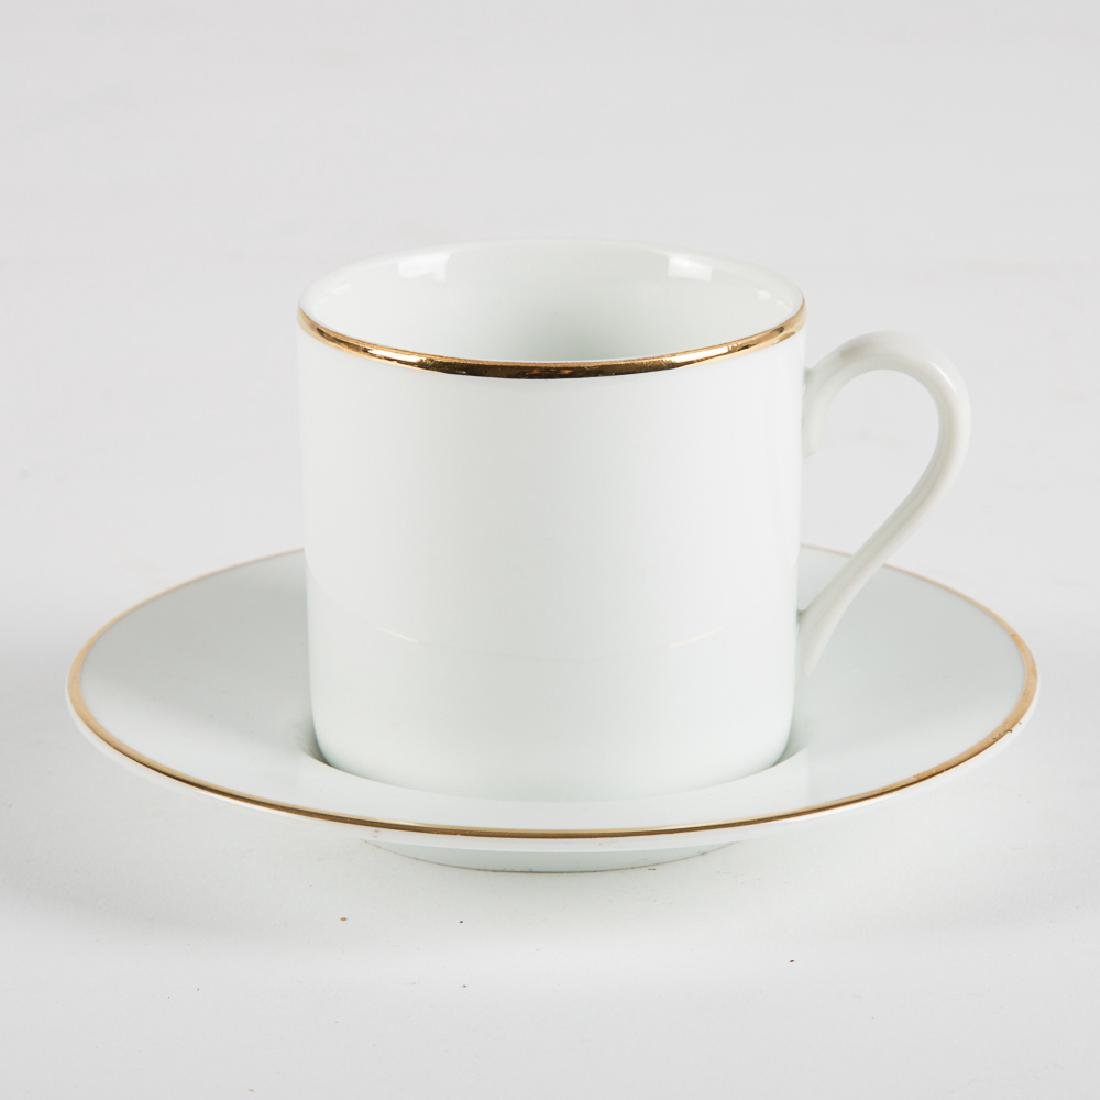 A Tiffany & Company Porcelain Large Demitasse Service, - 5